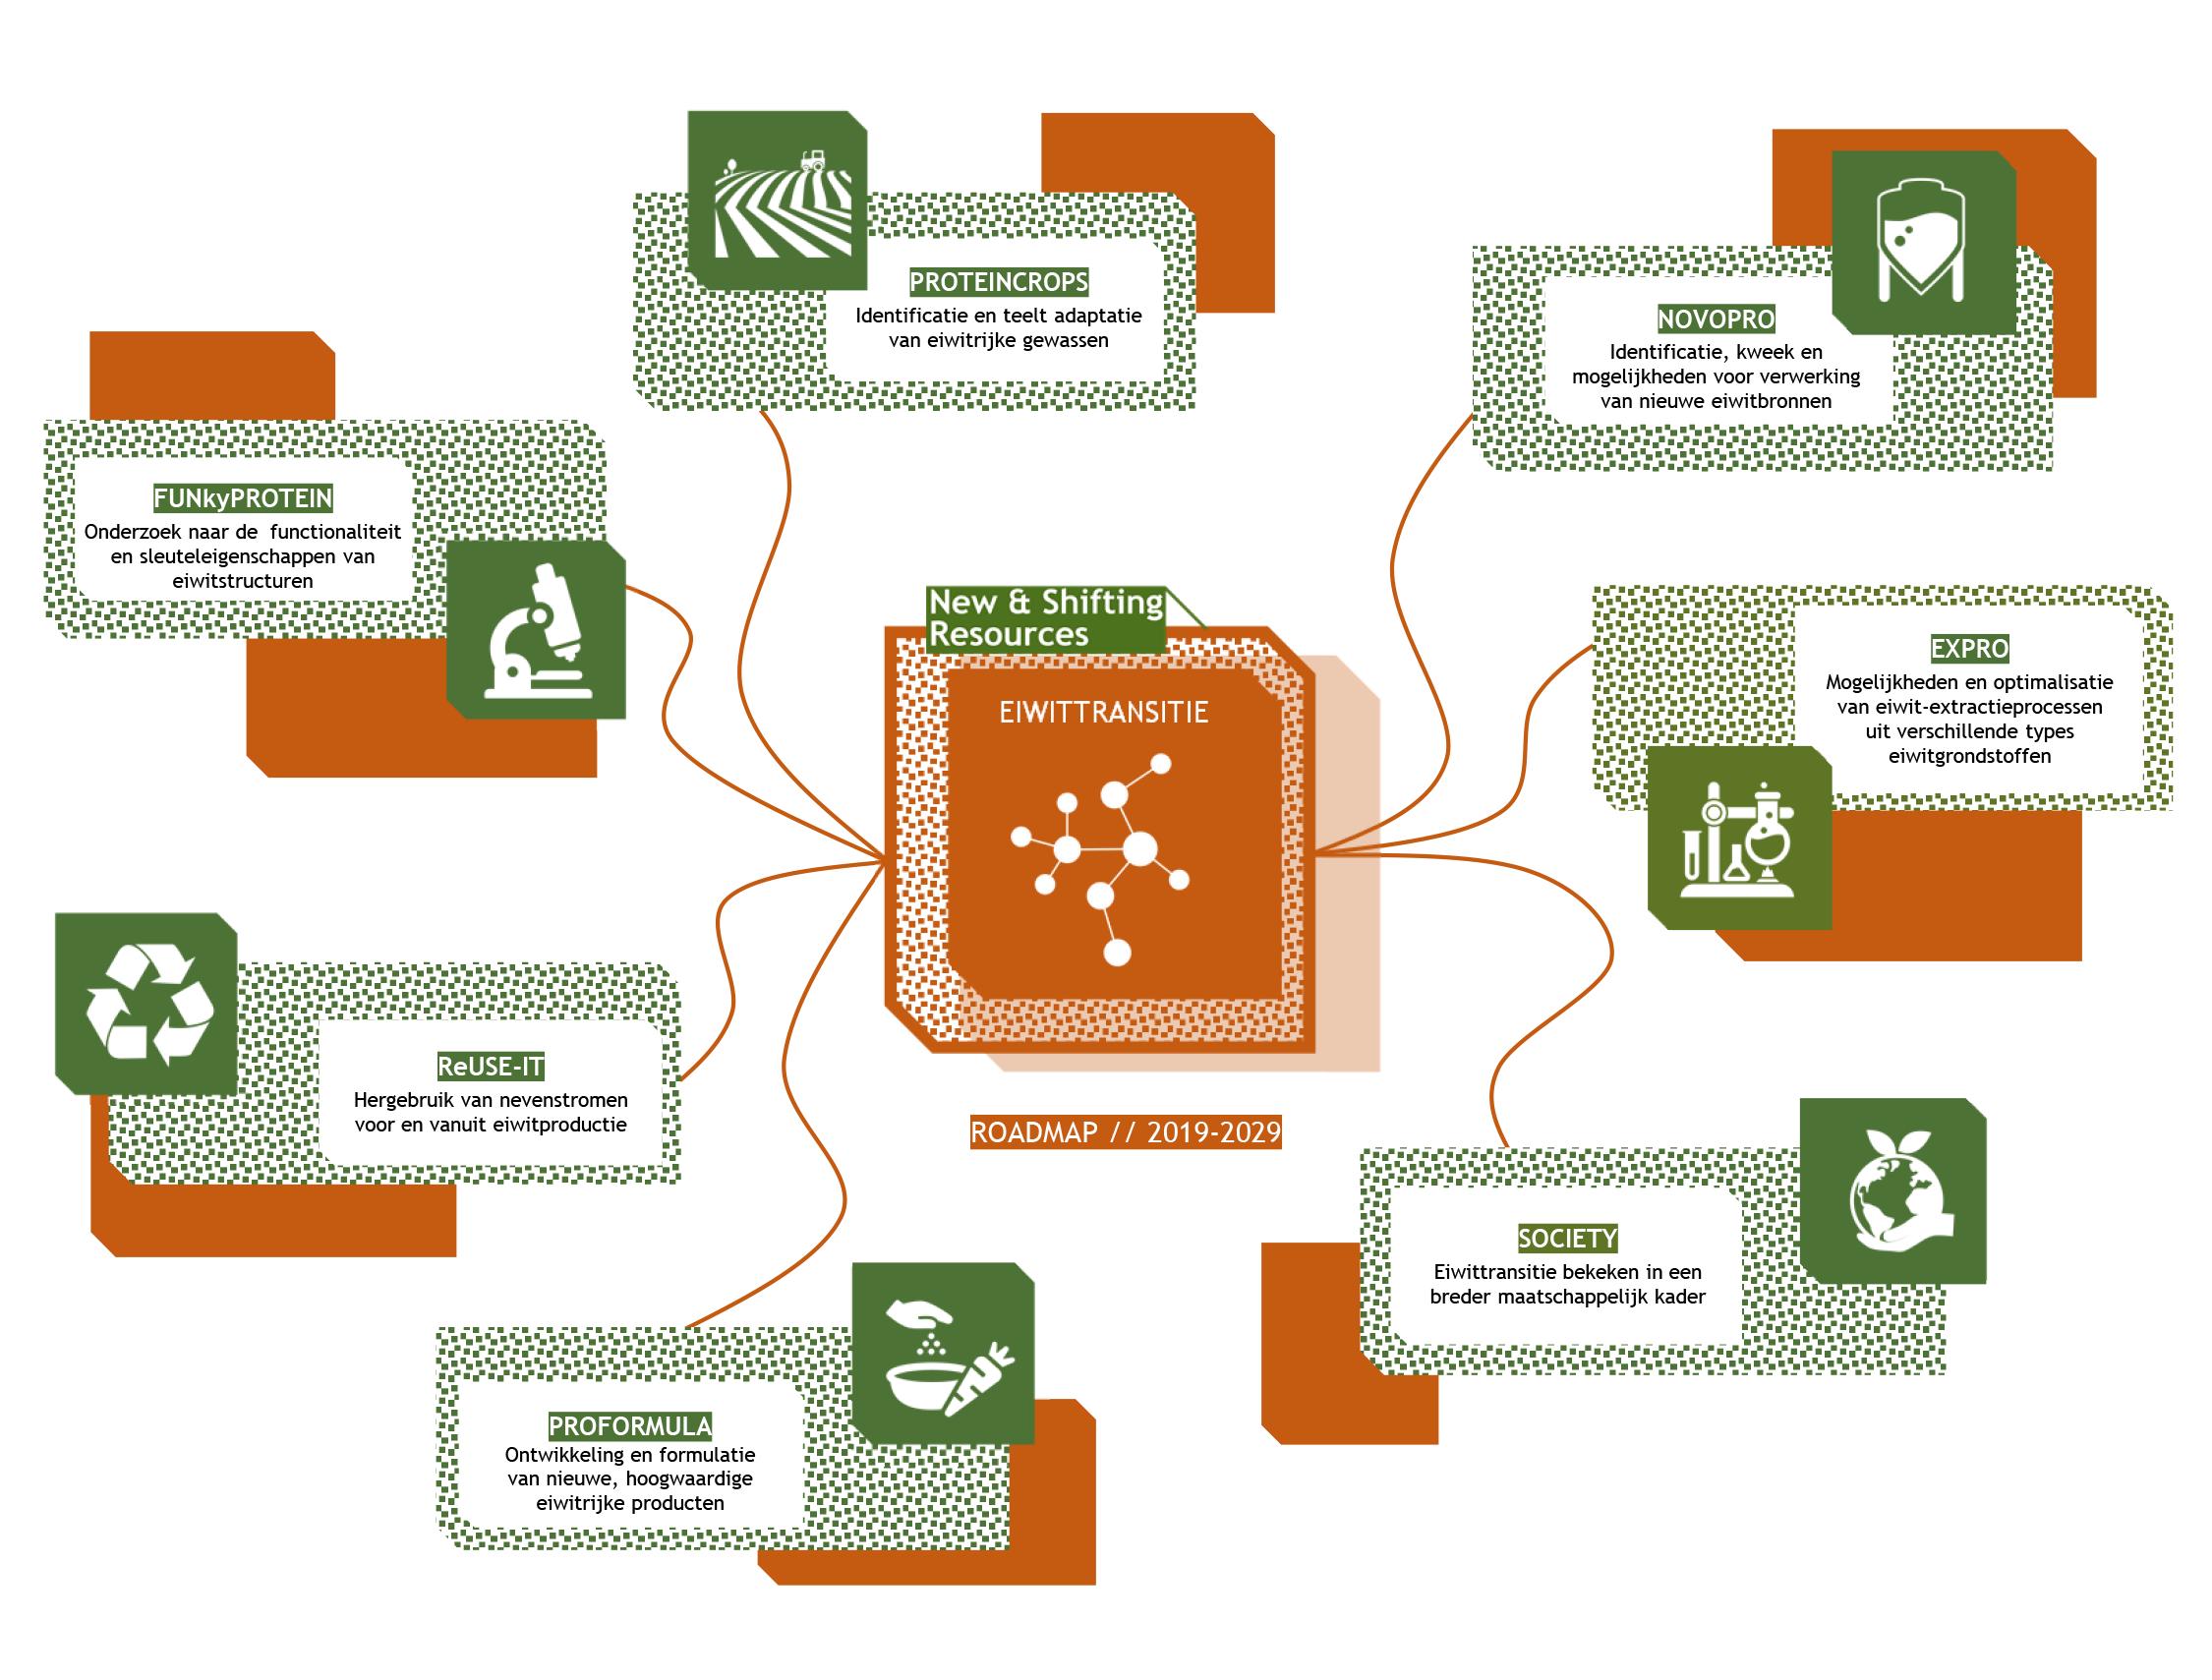 Roadmap figuur eiwittransitie